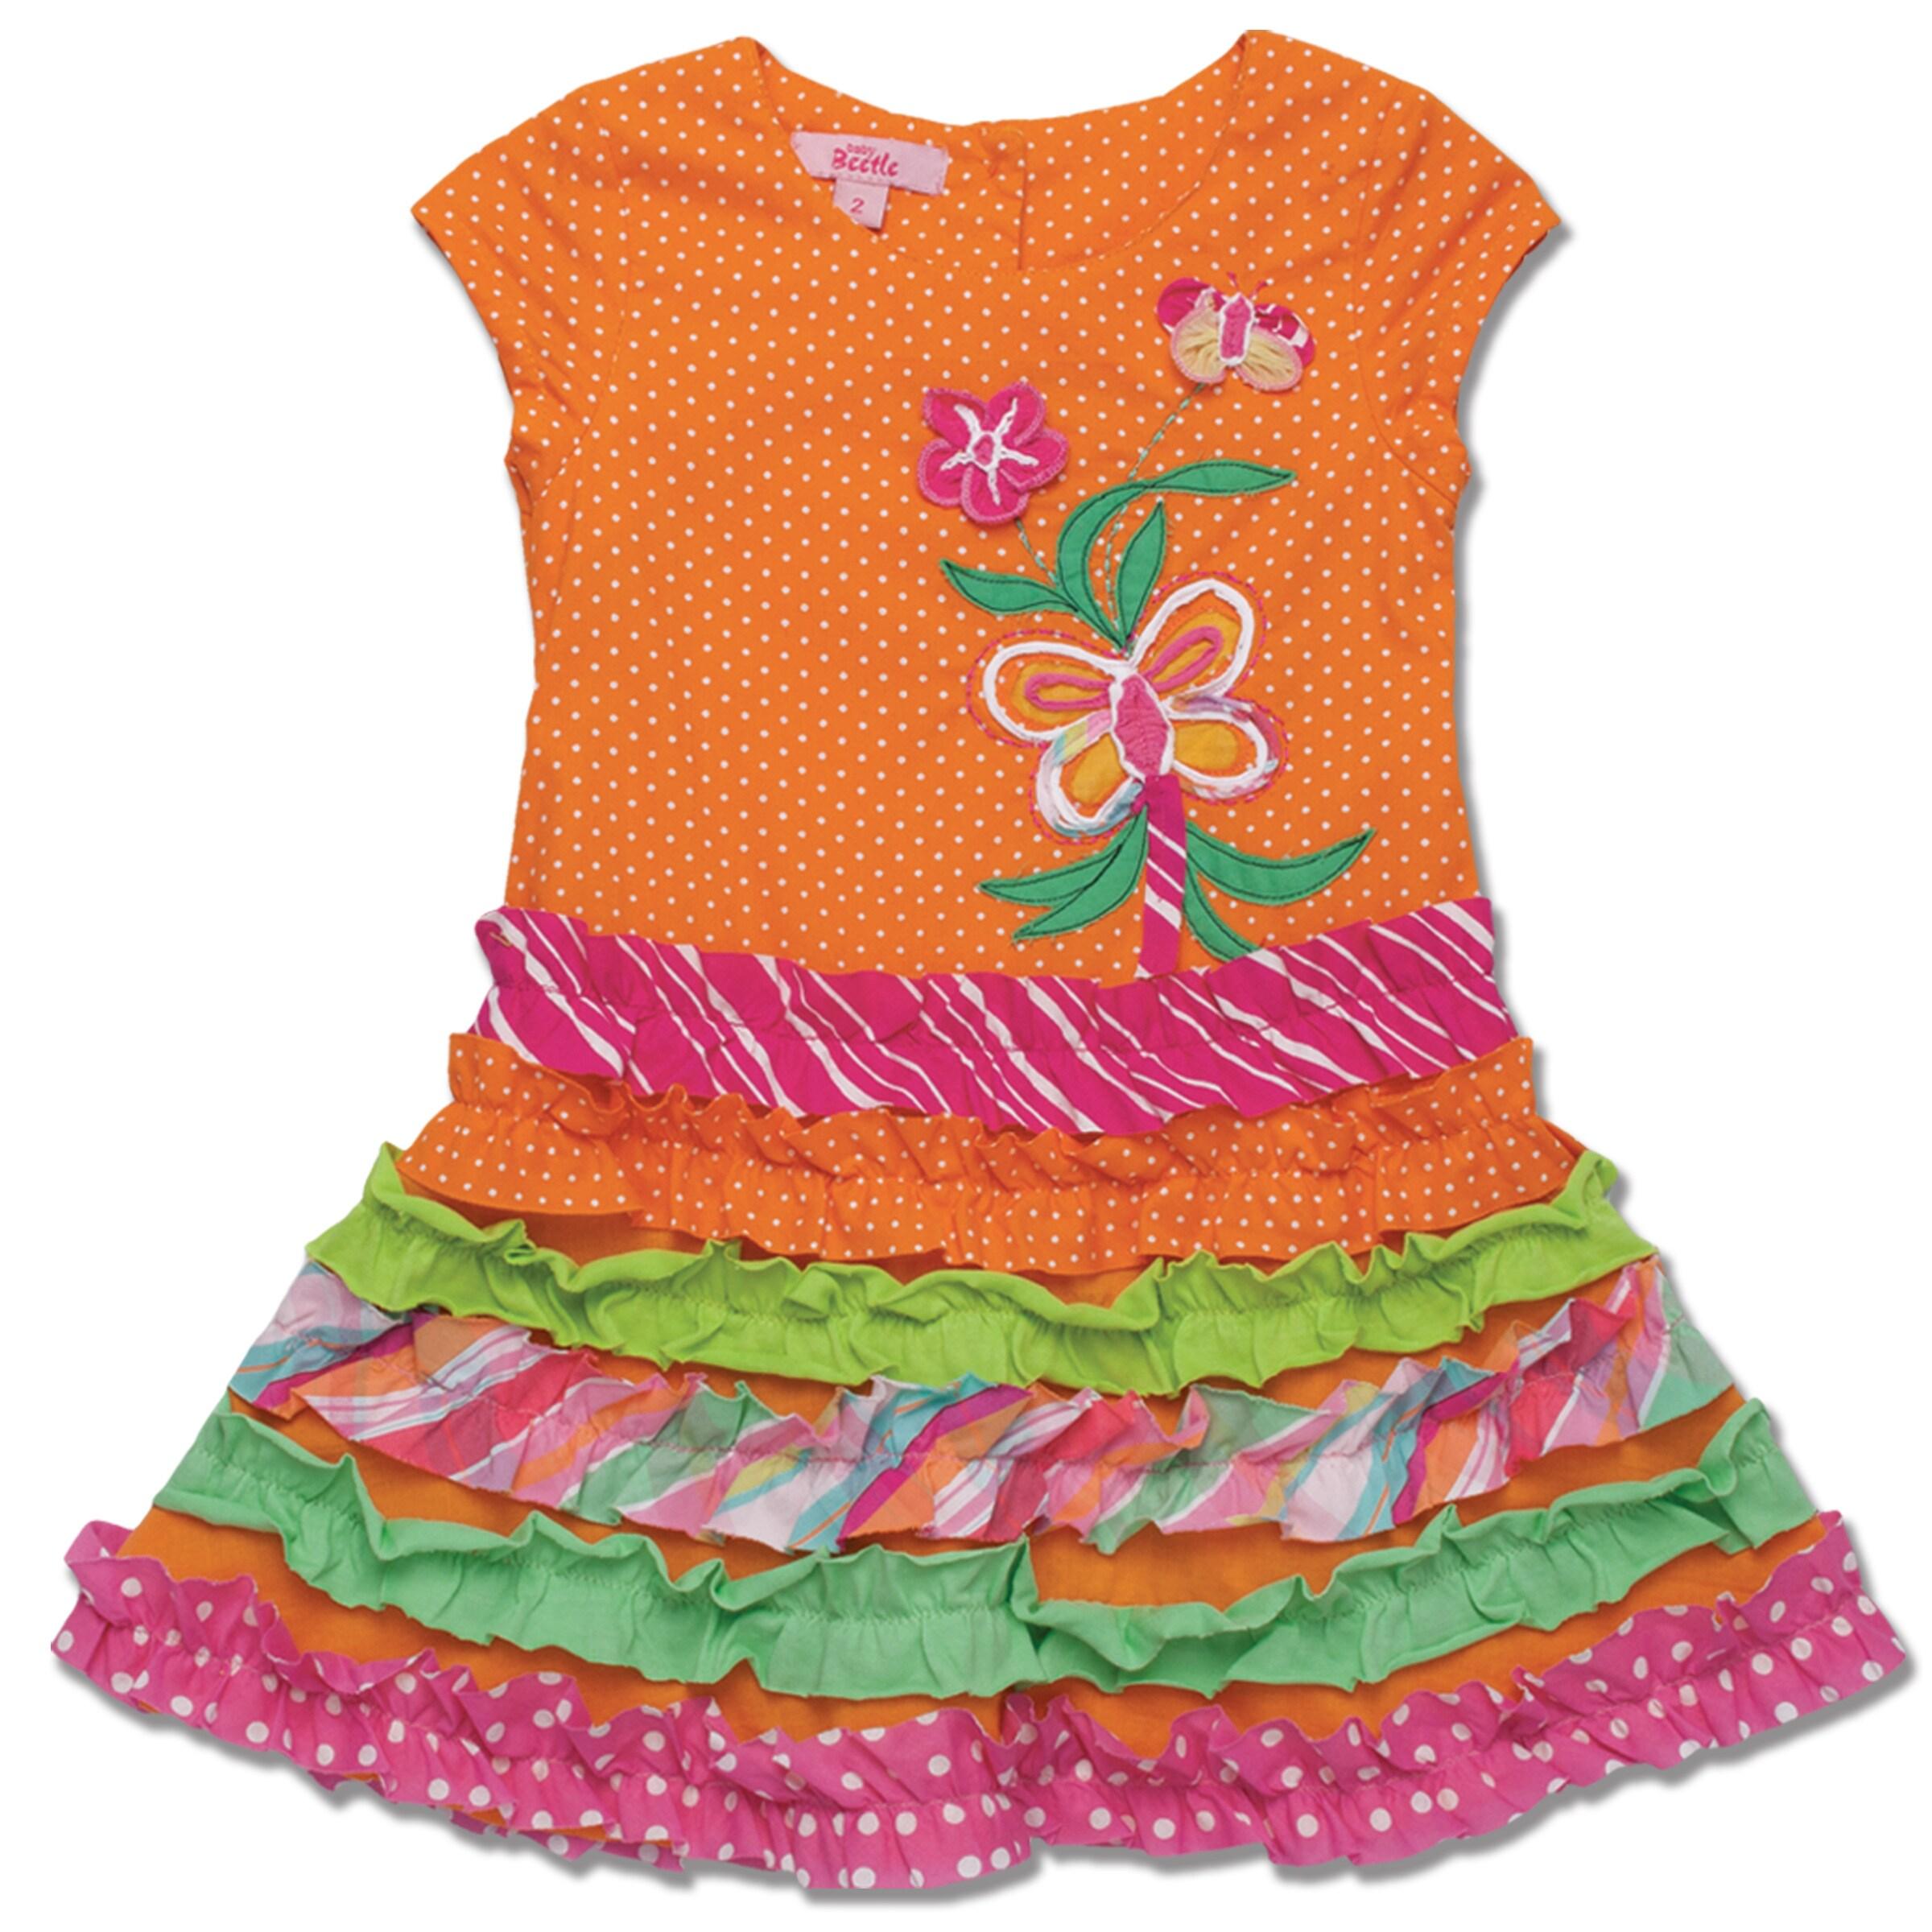 Beetlejuice London Girl's Orange Polka Dot Dress